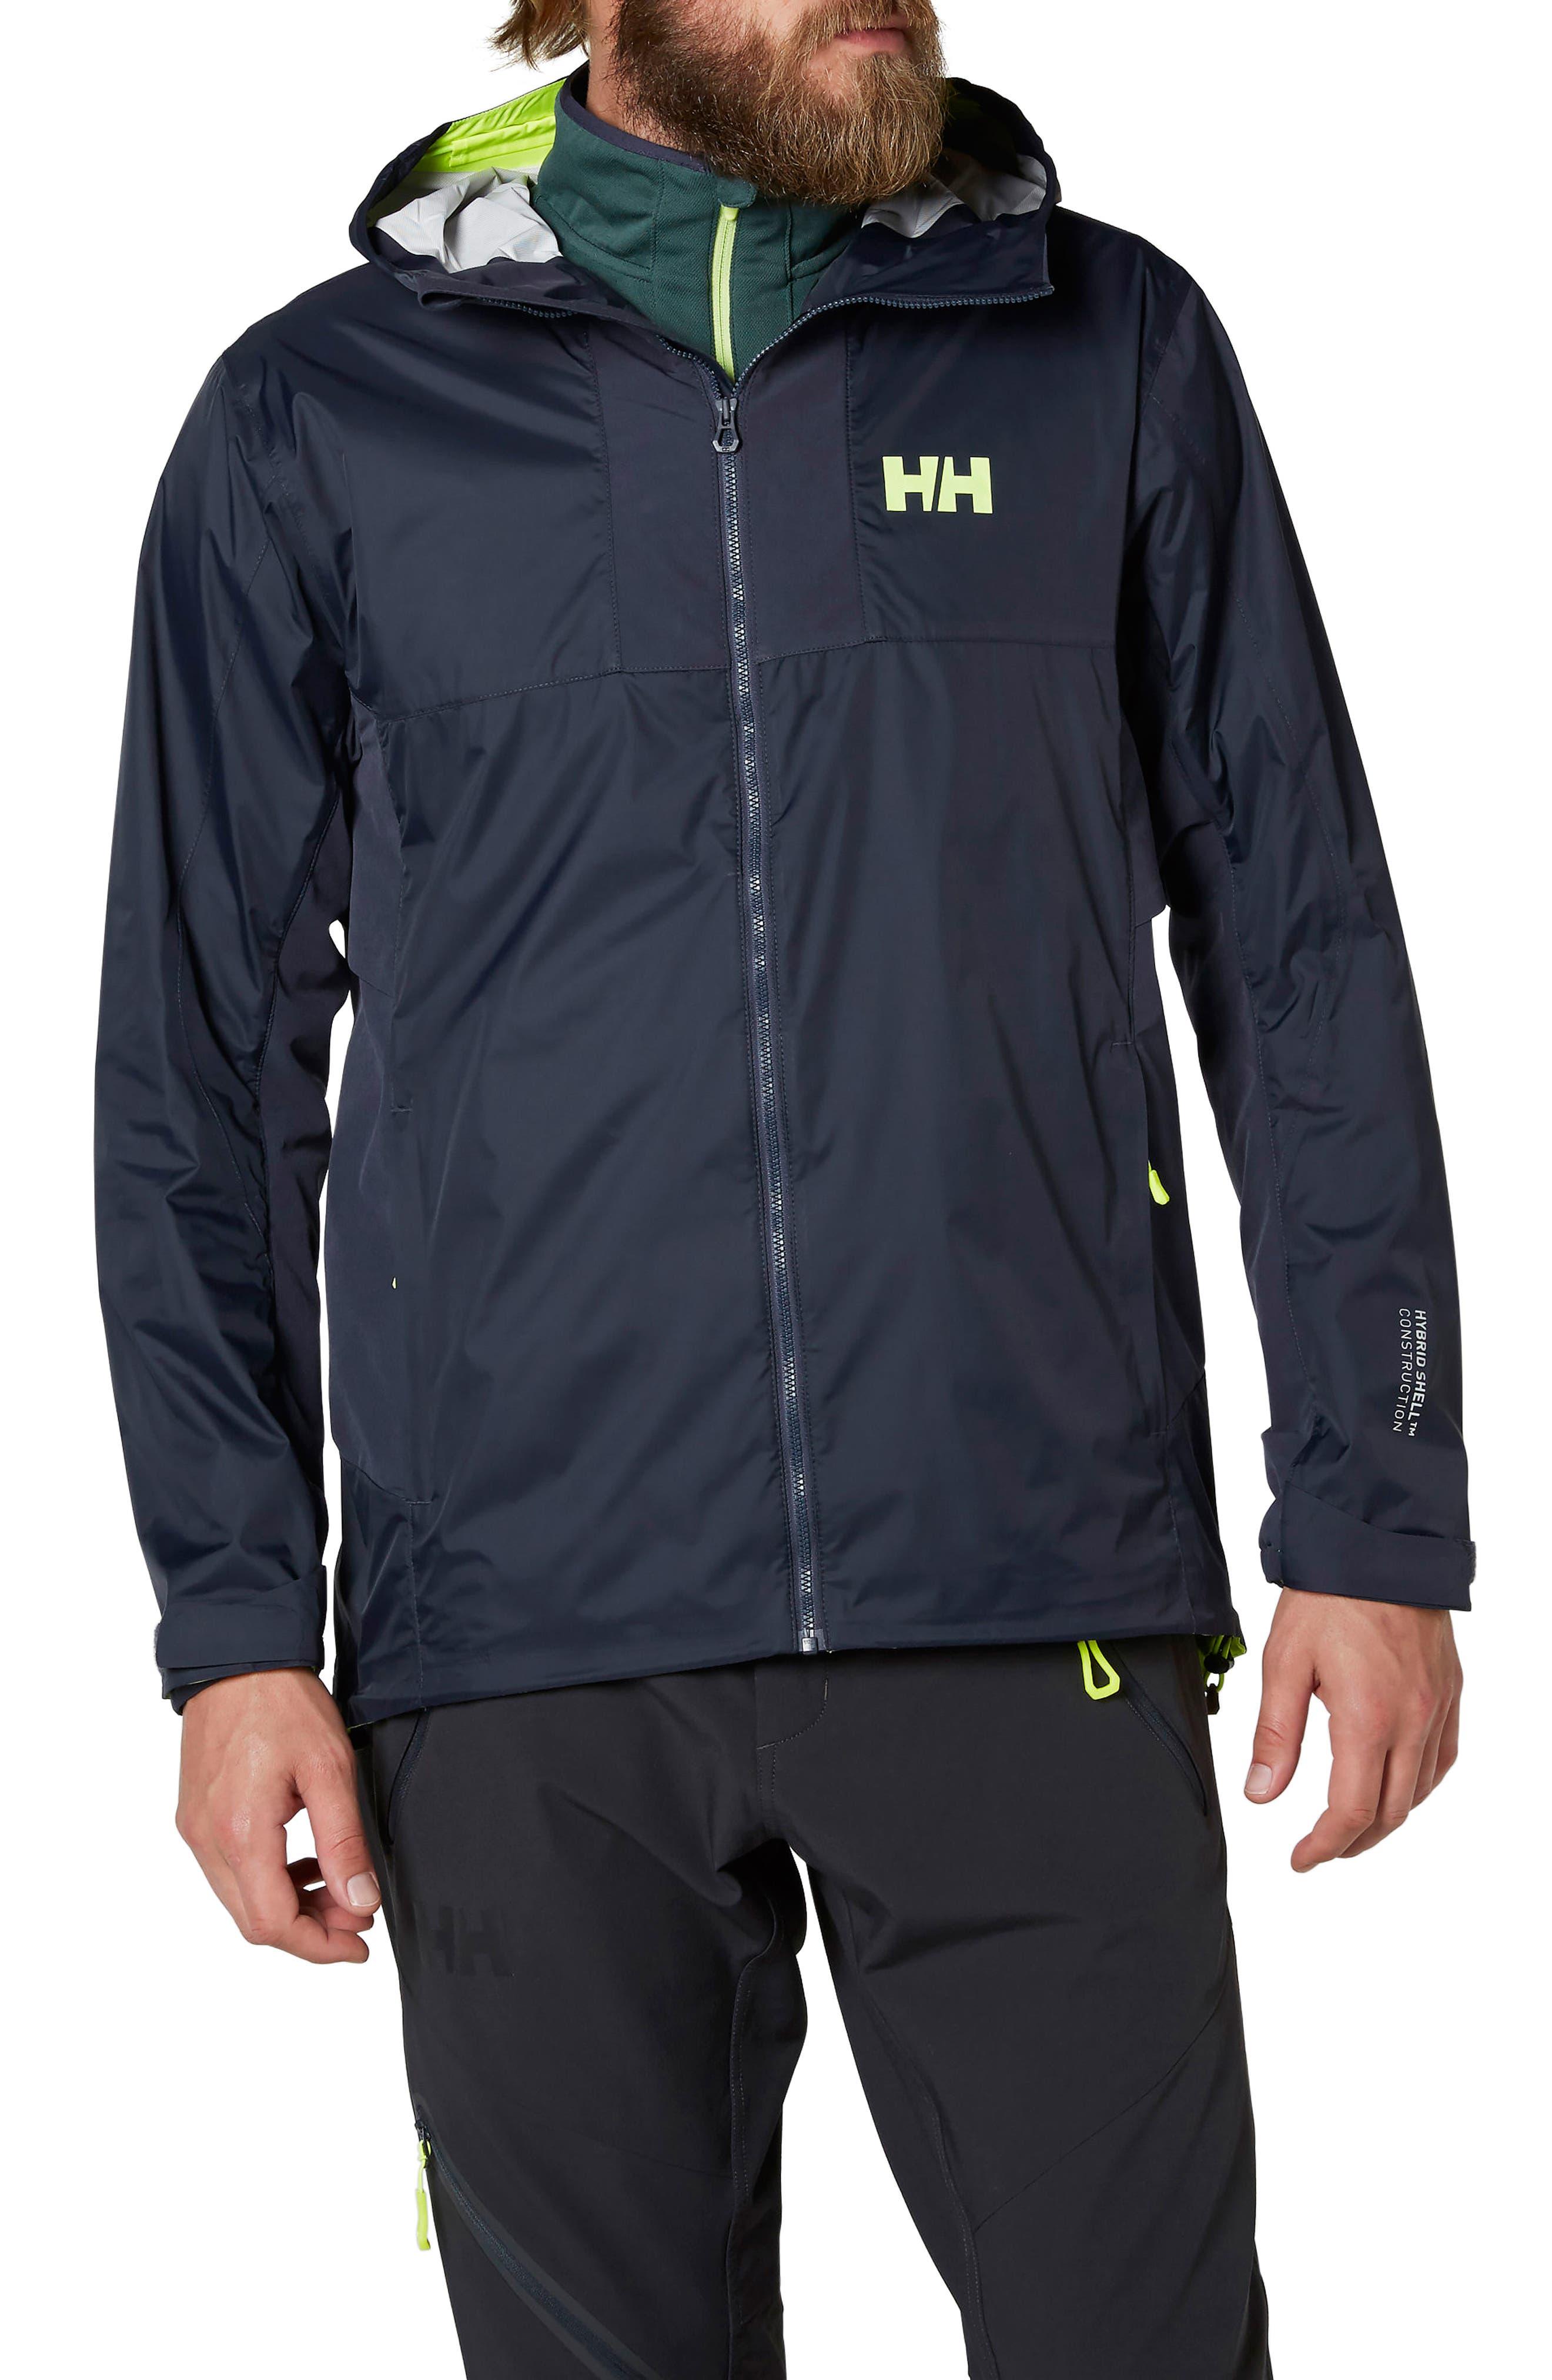 Vanir Logr Regular Fit Waterproof Jacket,                             Main thumbnail 1, color,                             Graphite Blue